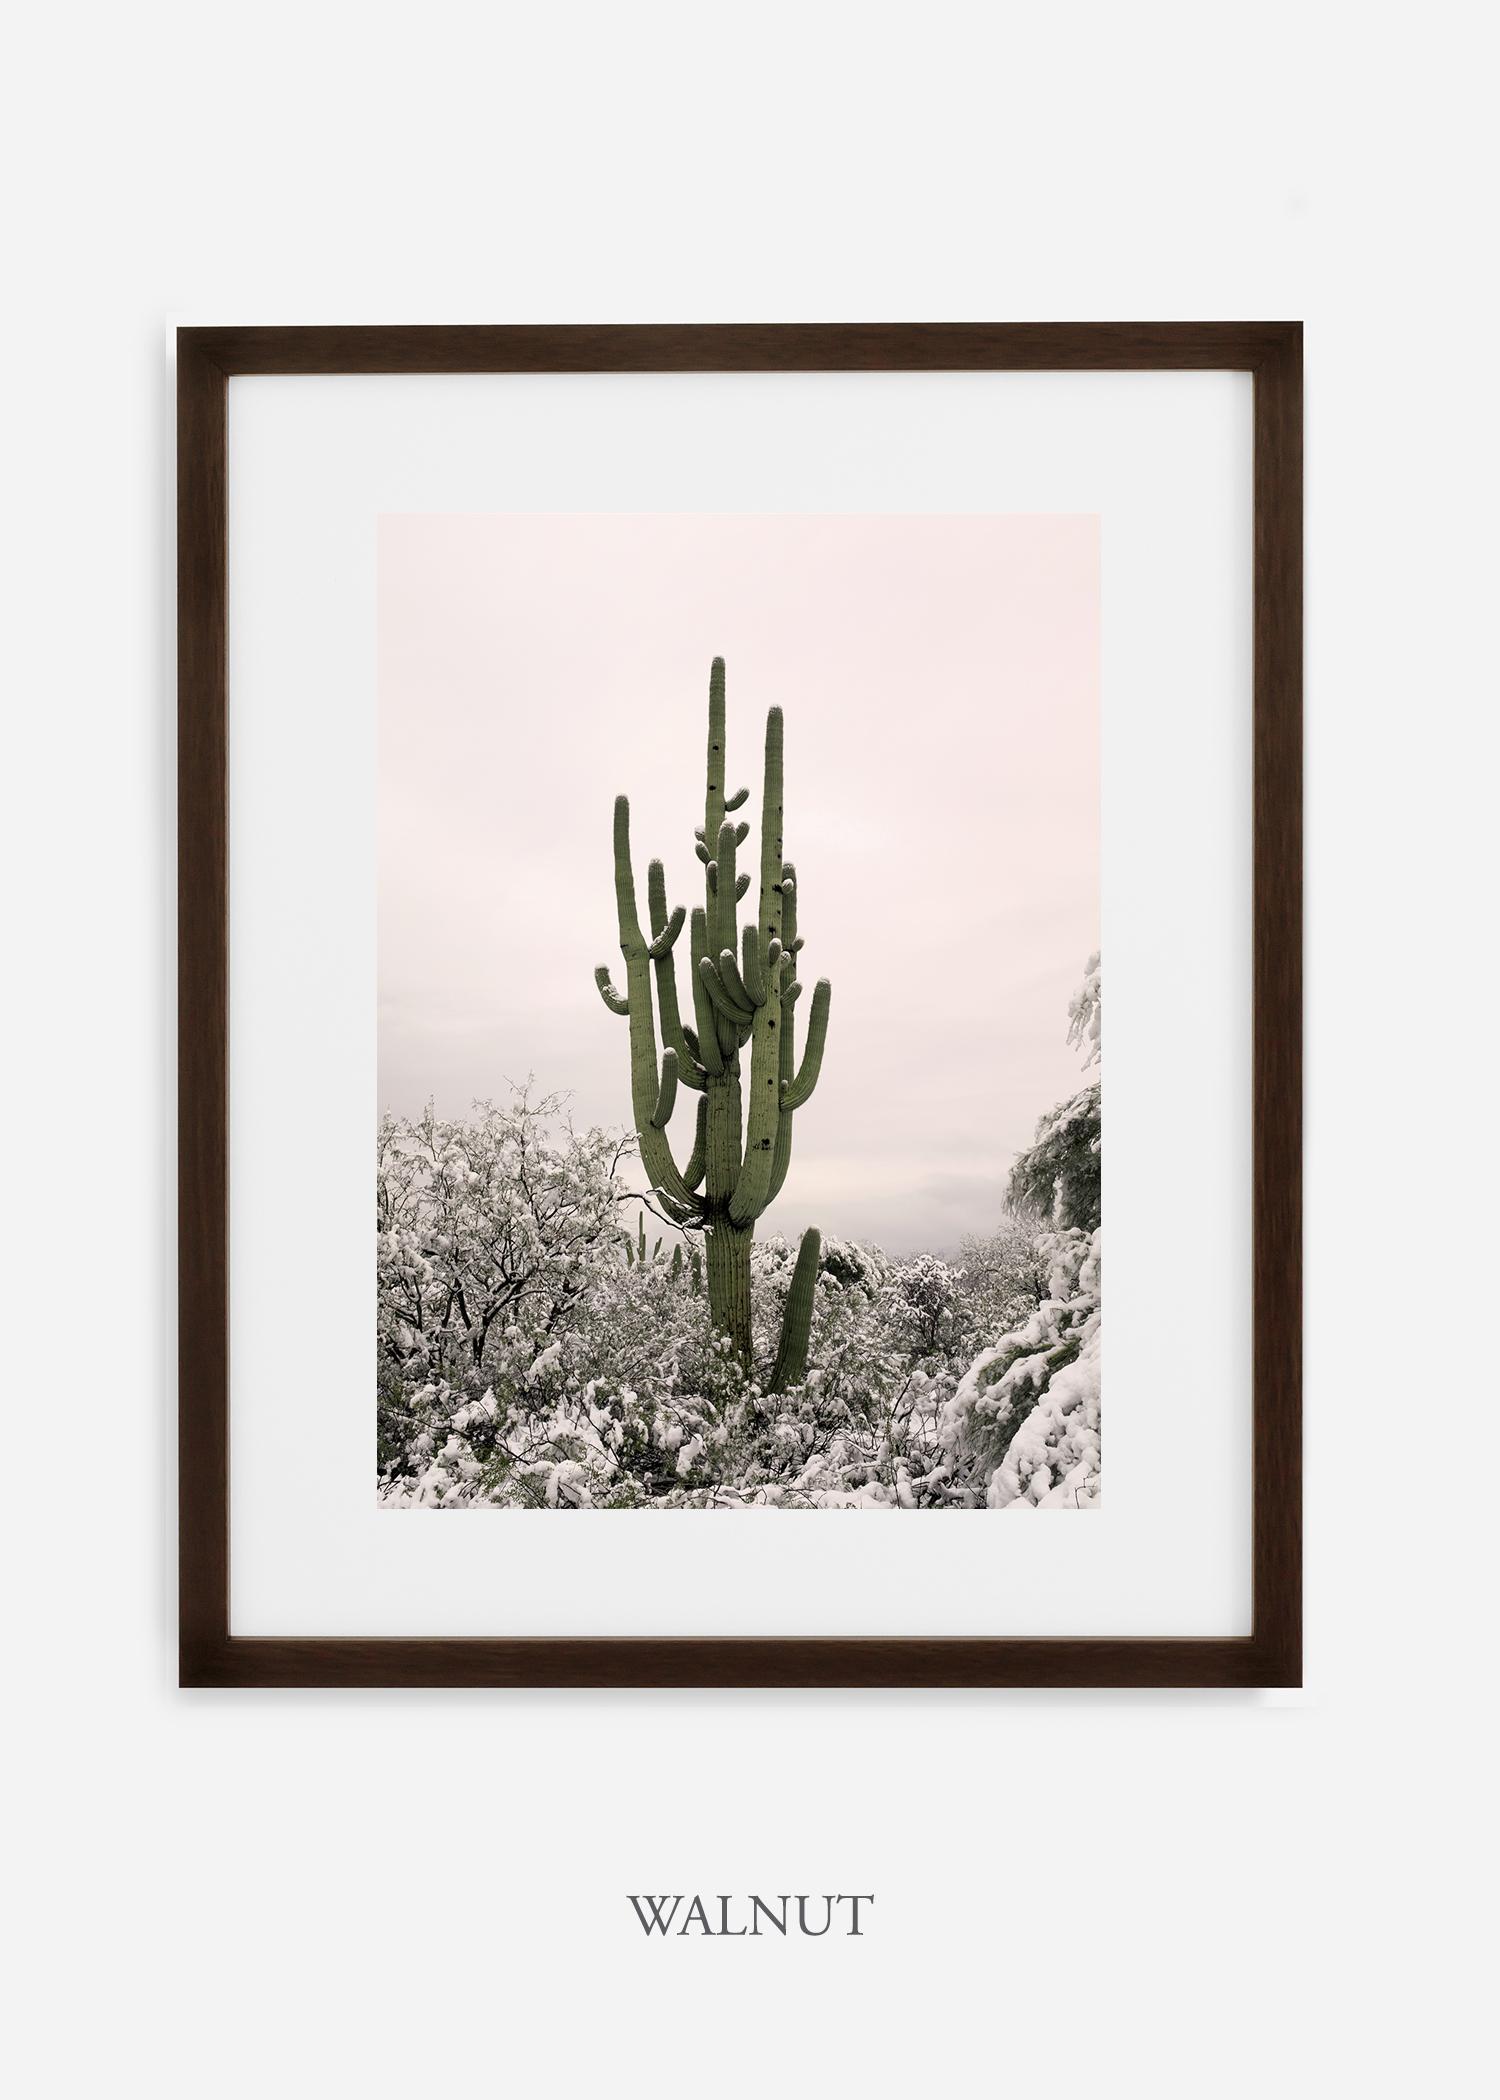 walnutframe-saguaroNo.8-wildercalifornia-art-wallart-cactusprint-homedecor-prints-arizona-botanical-artwork-interiordesign.jpg